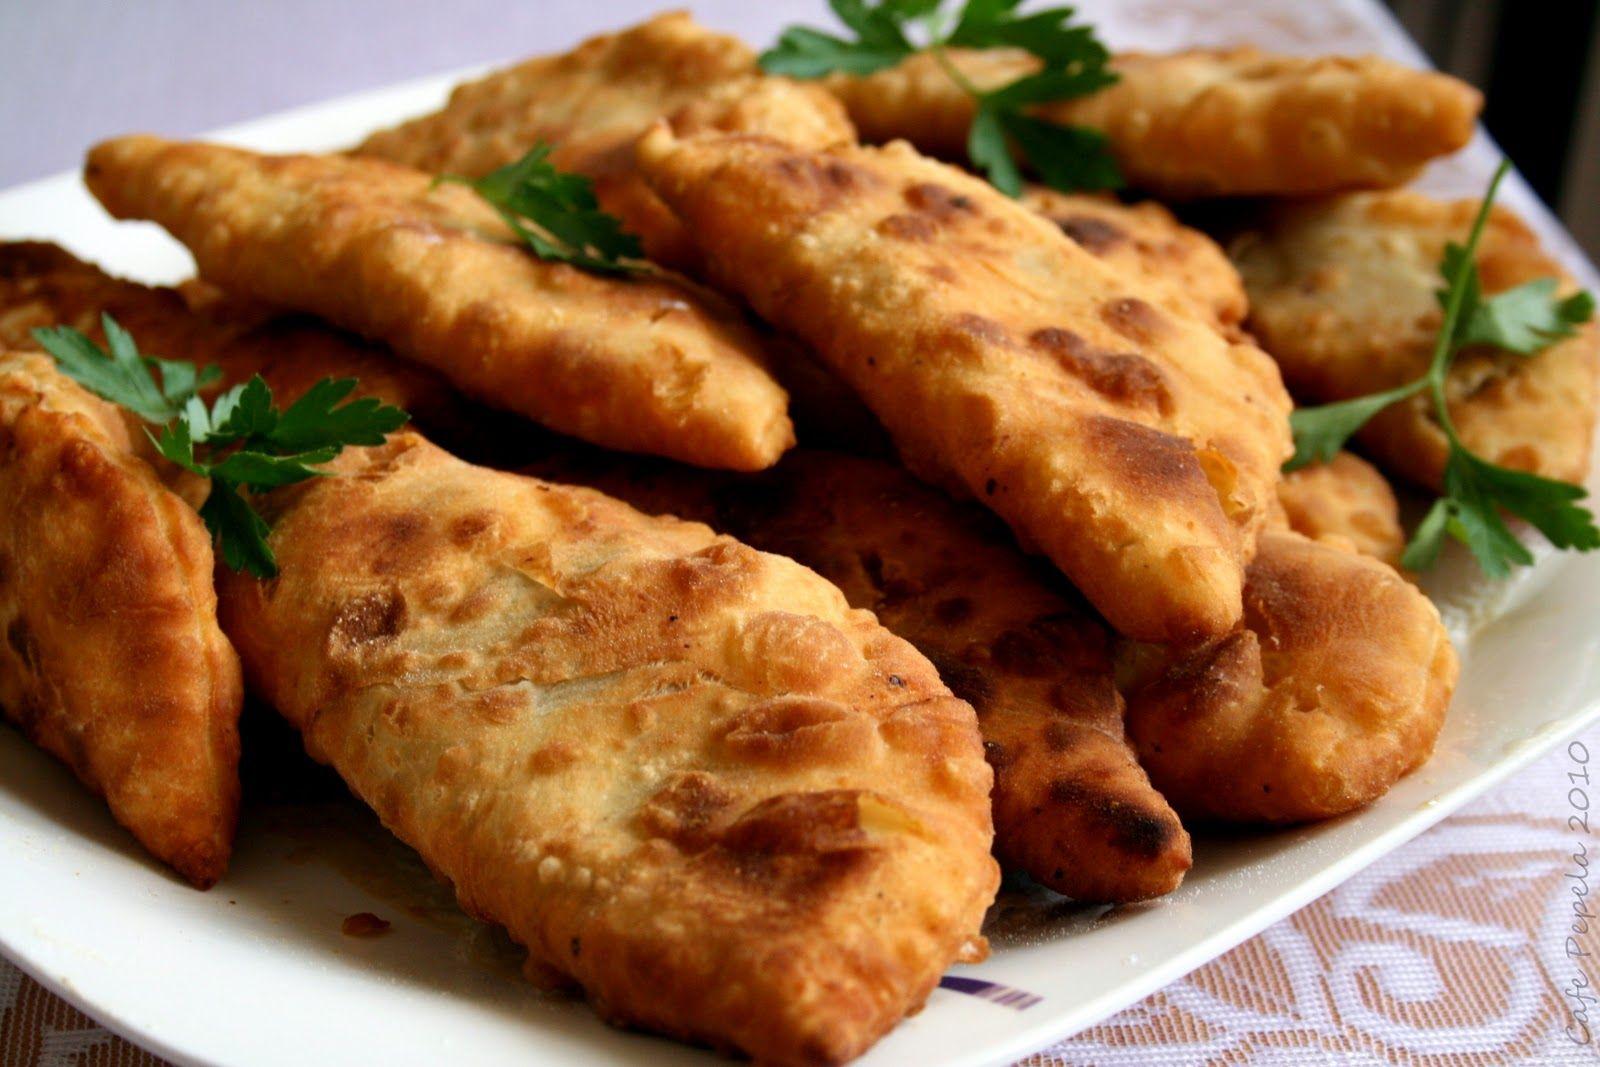 çiğ börek, Turkish Pastry